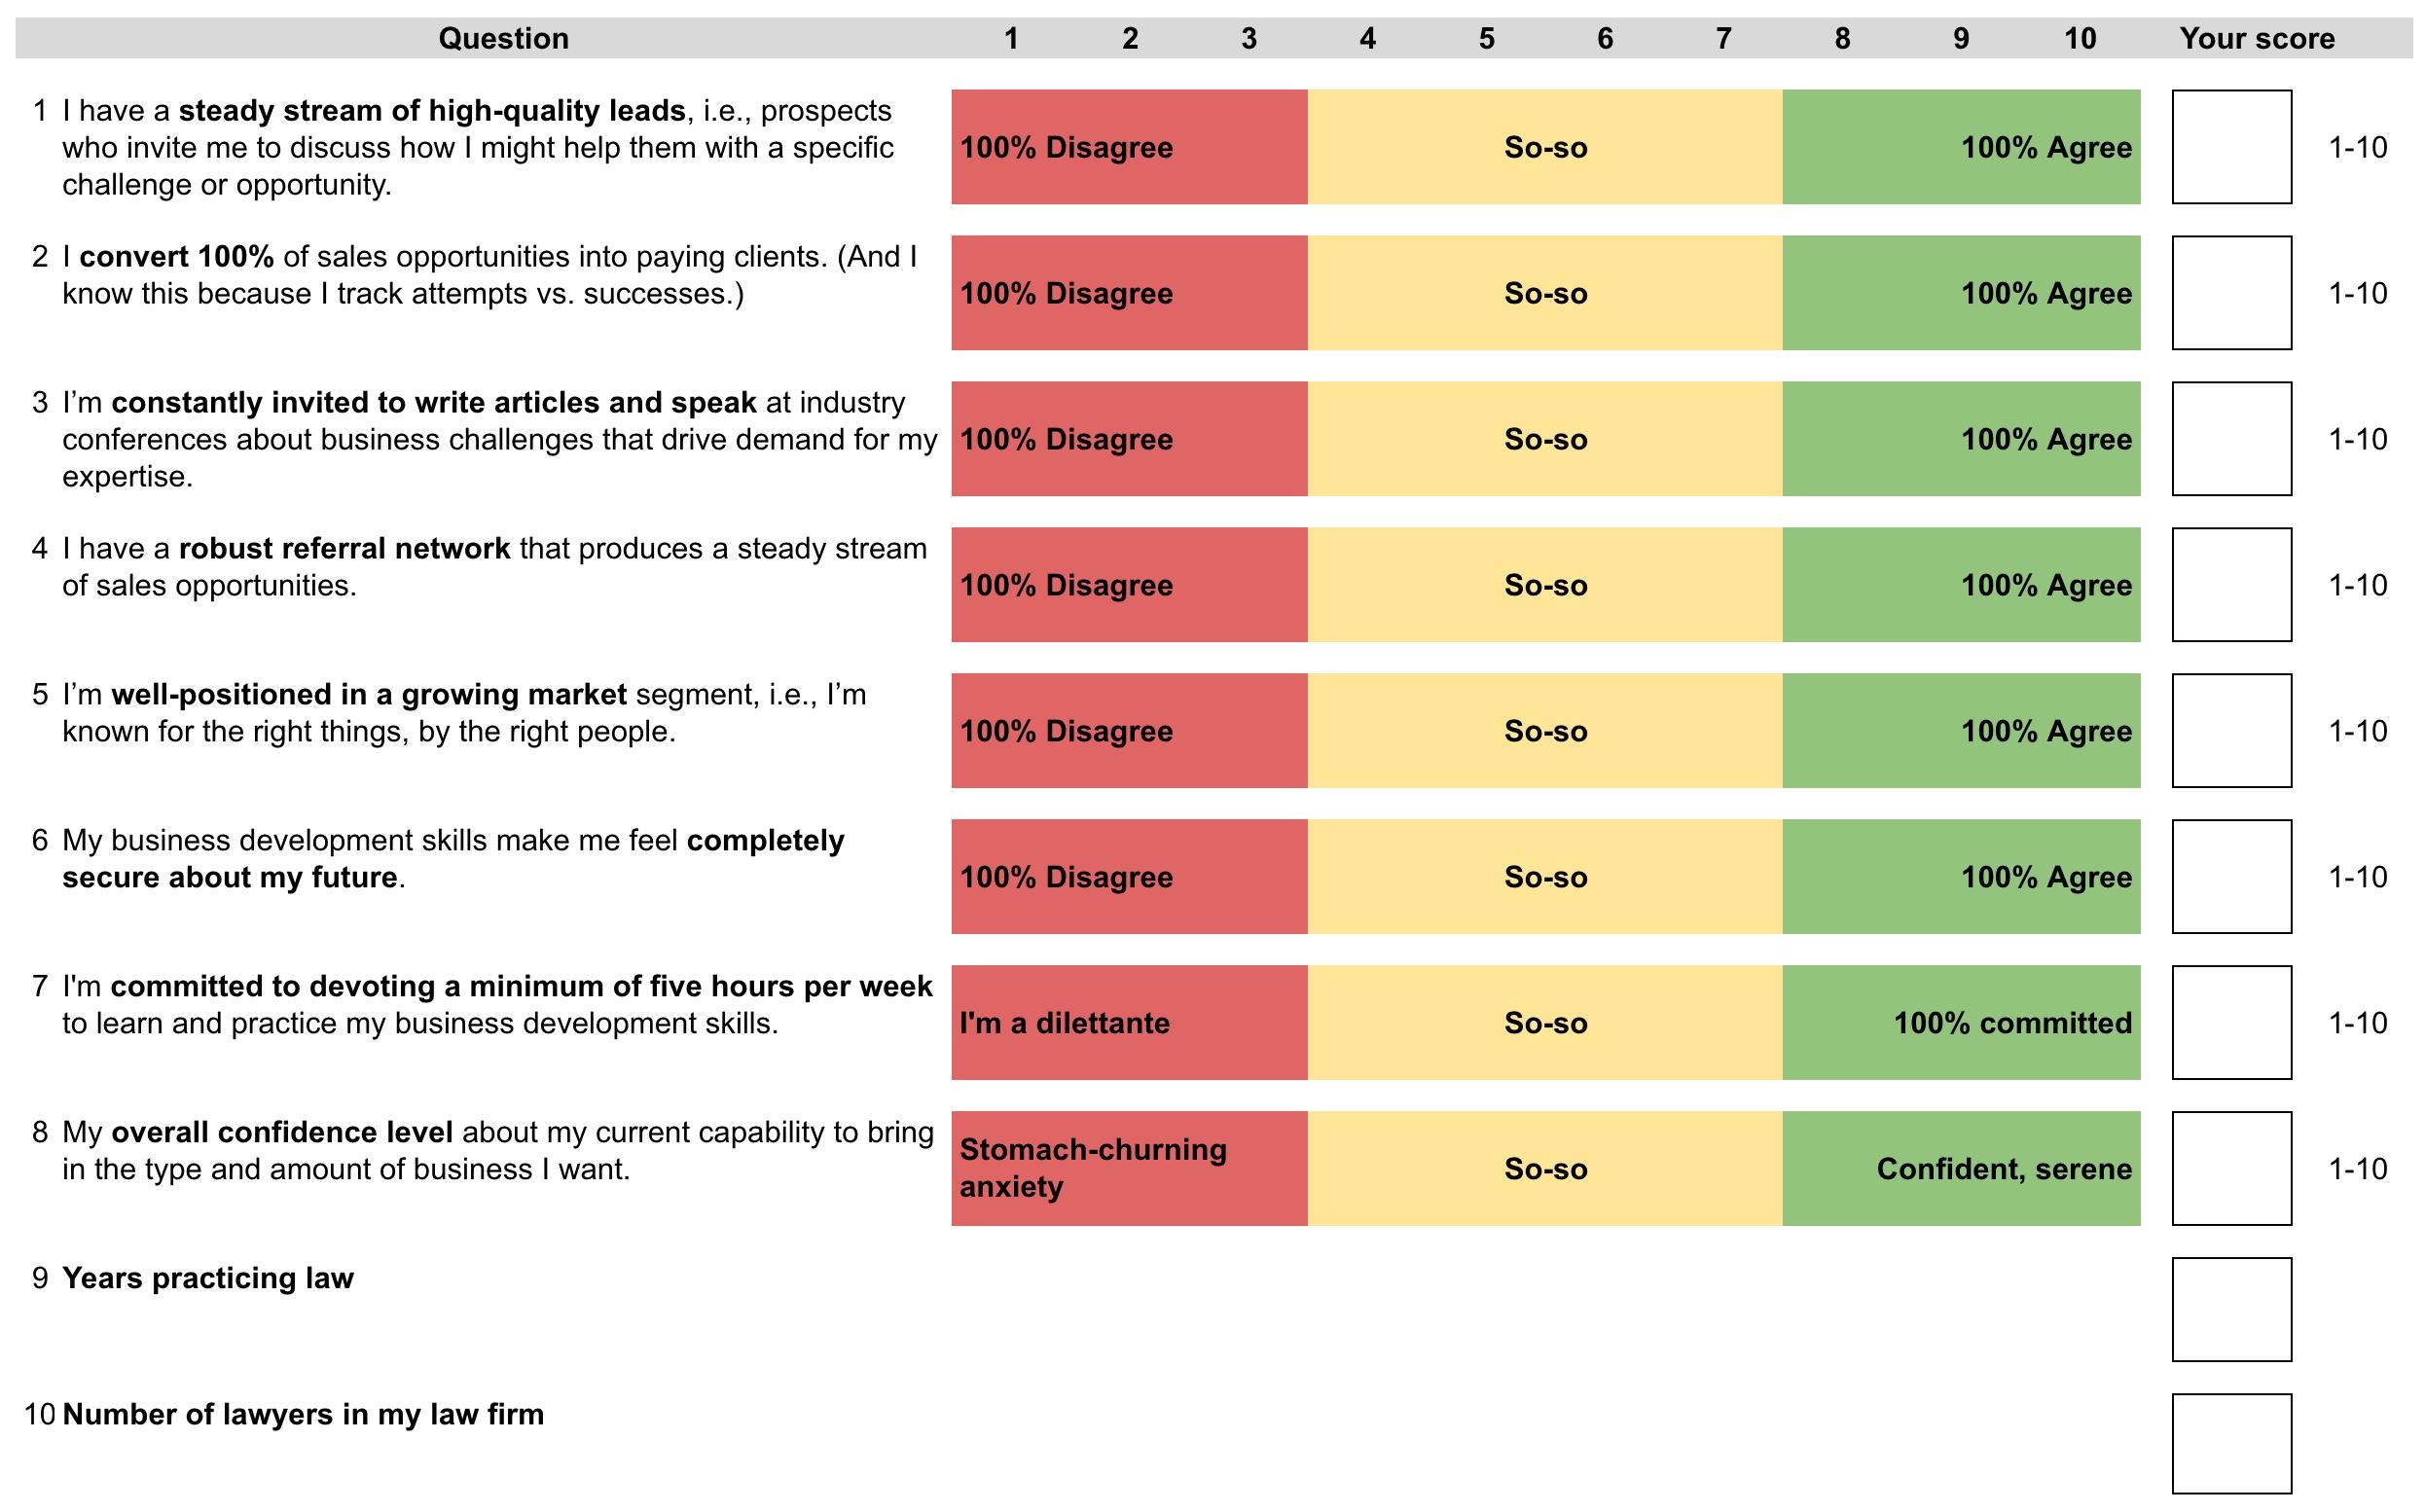 Lawyer_BizGen_Confidence_survey_-_Google_Sheets.jpg